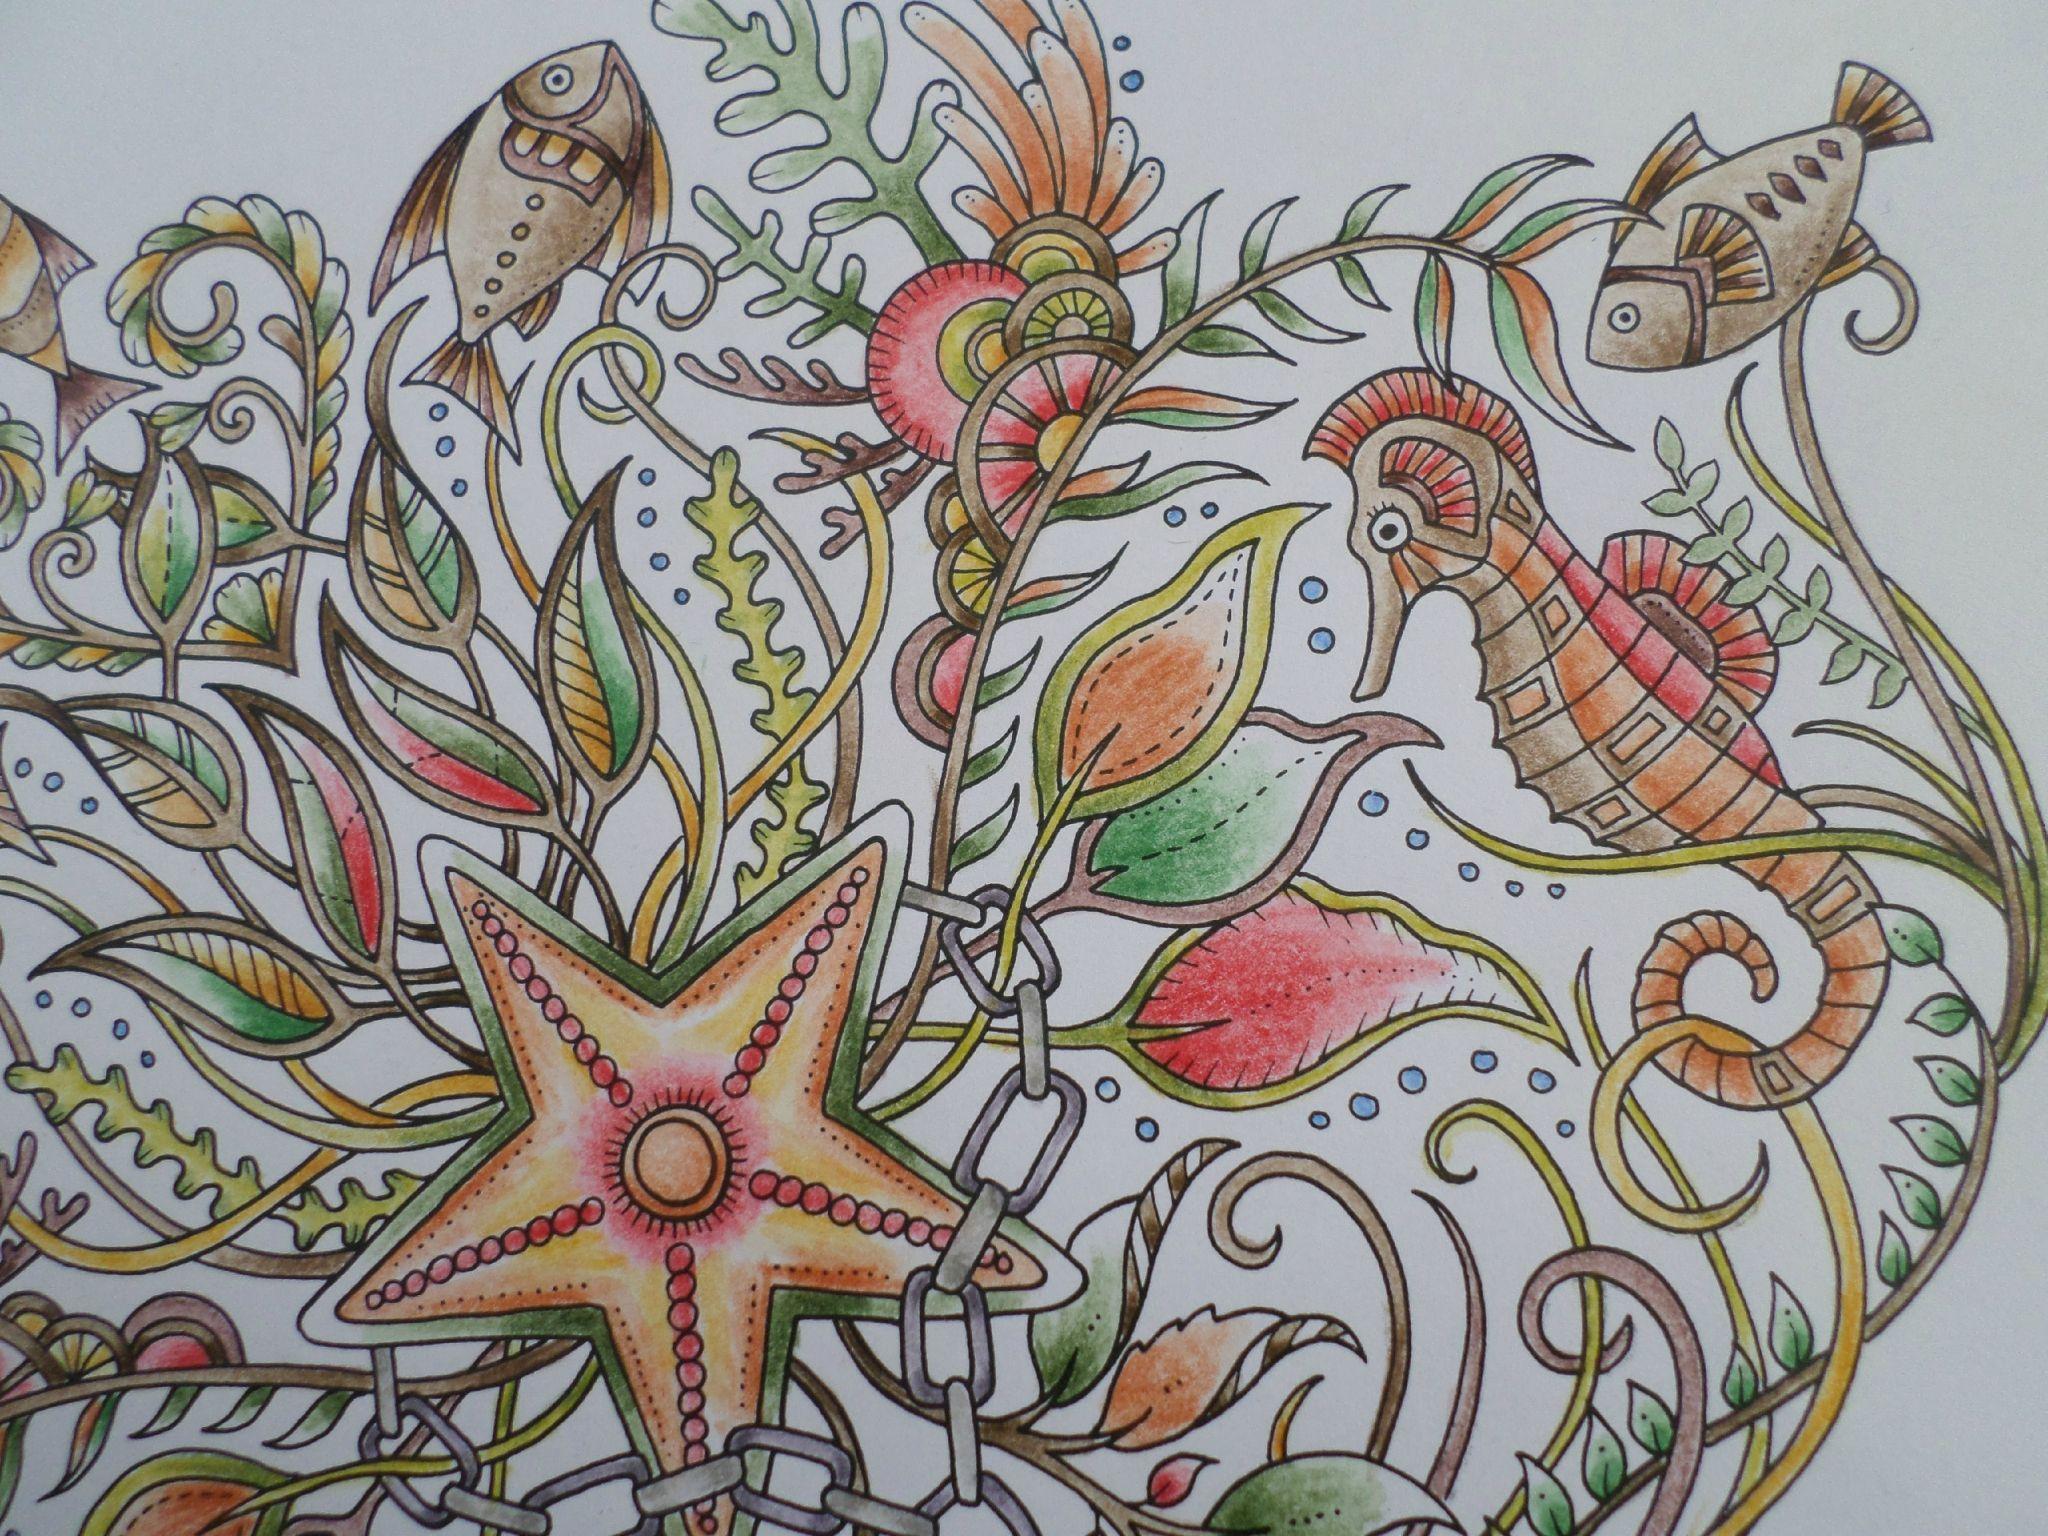 Coloriage livre Ocean Perdu Johanna Basford par steffy Elsass crea